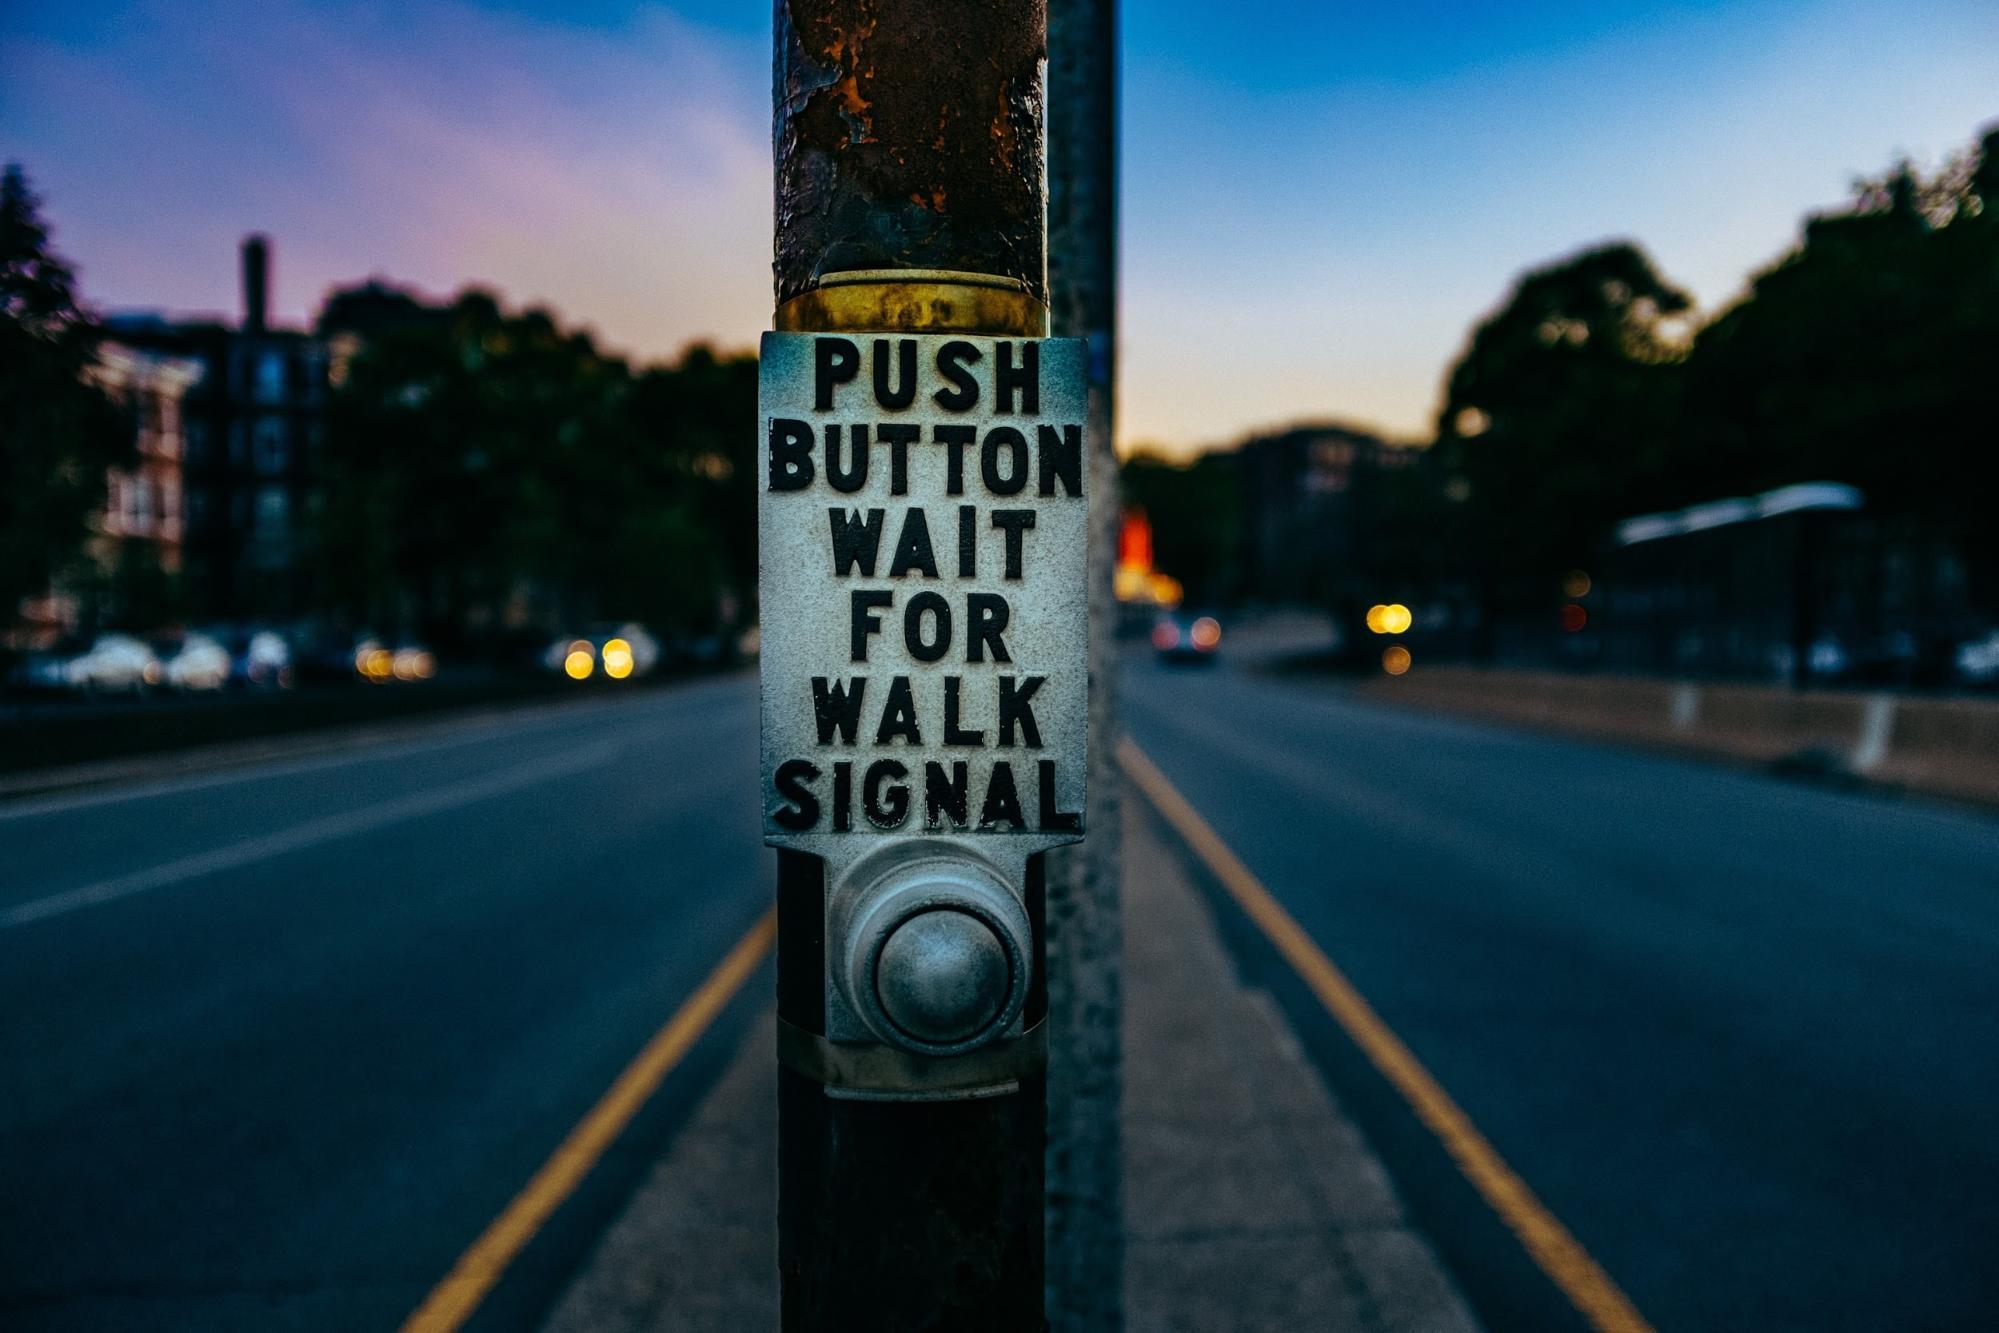 Walk signal button